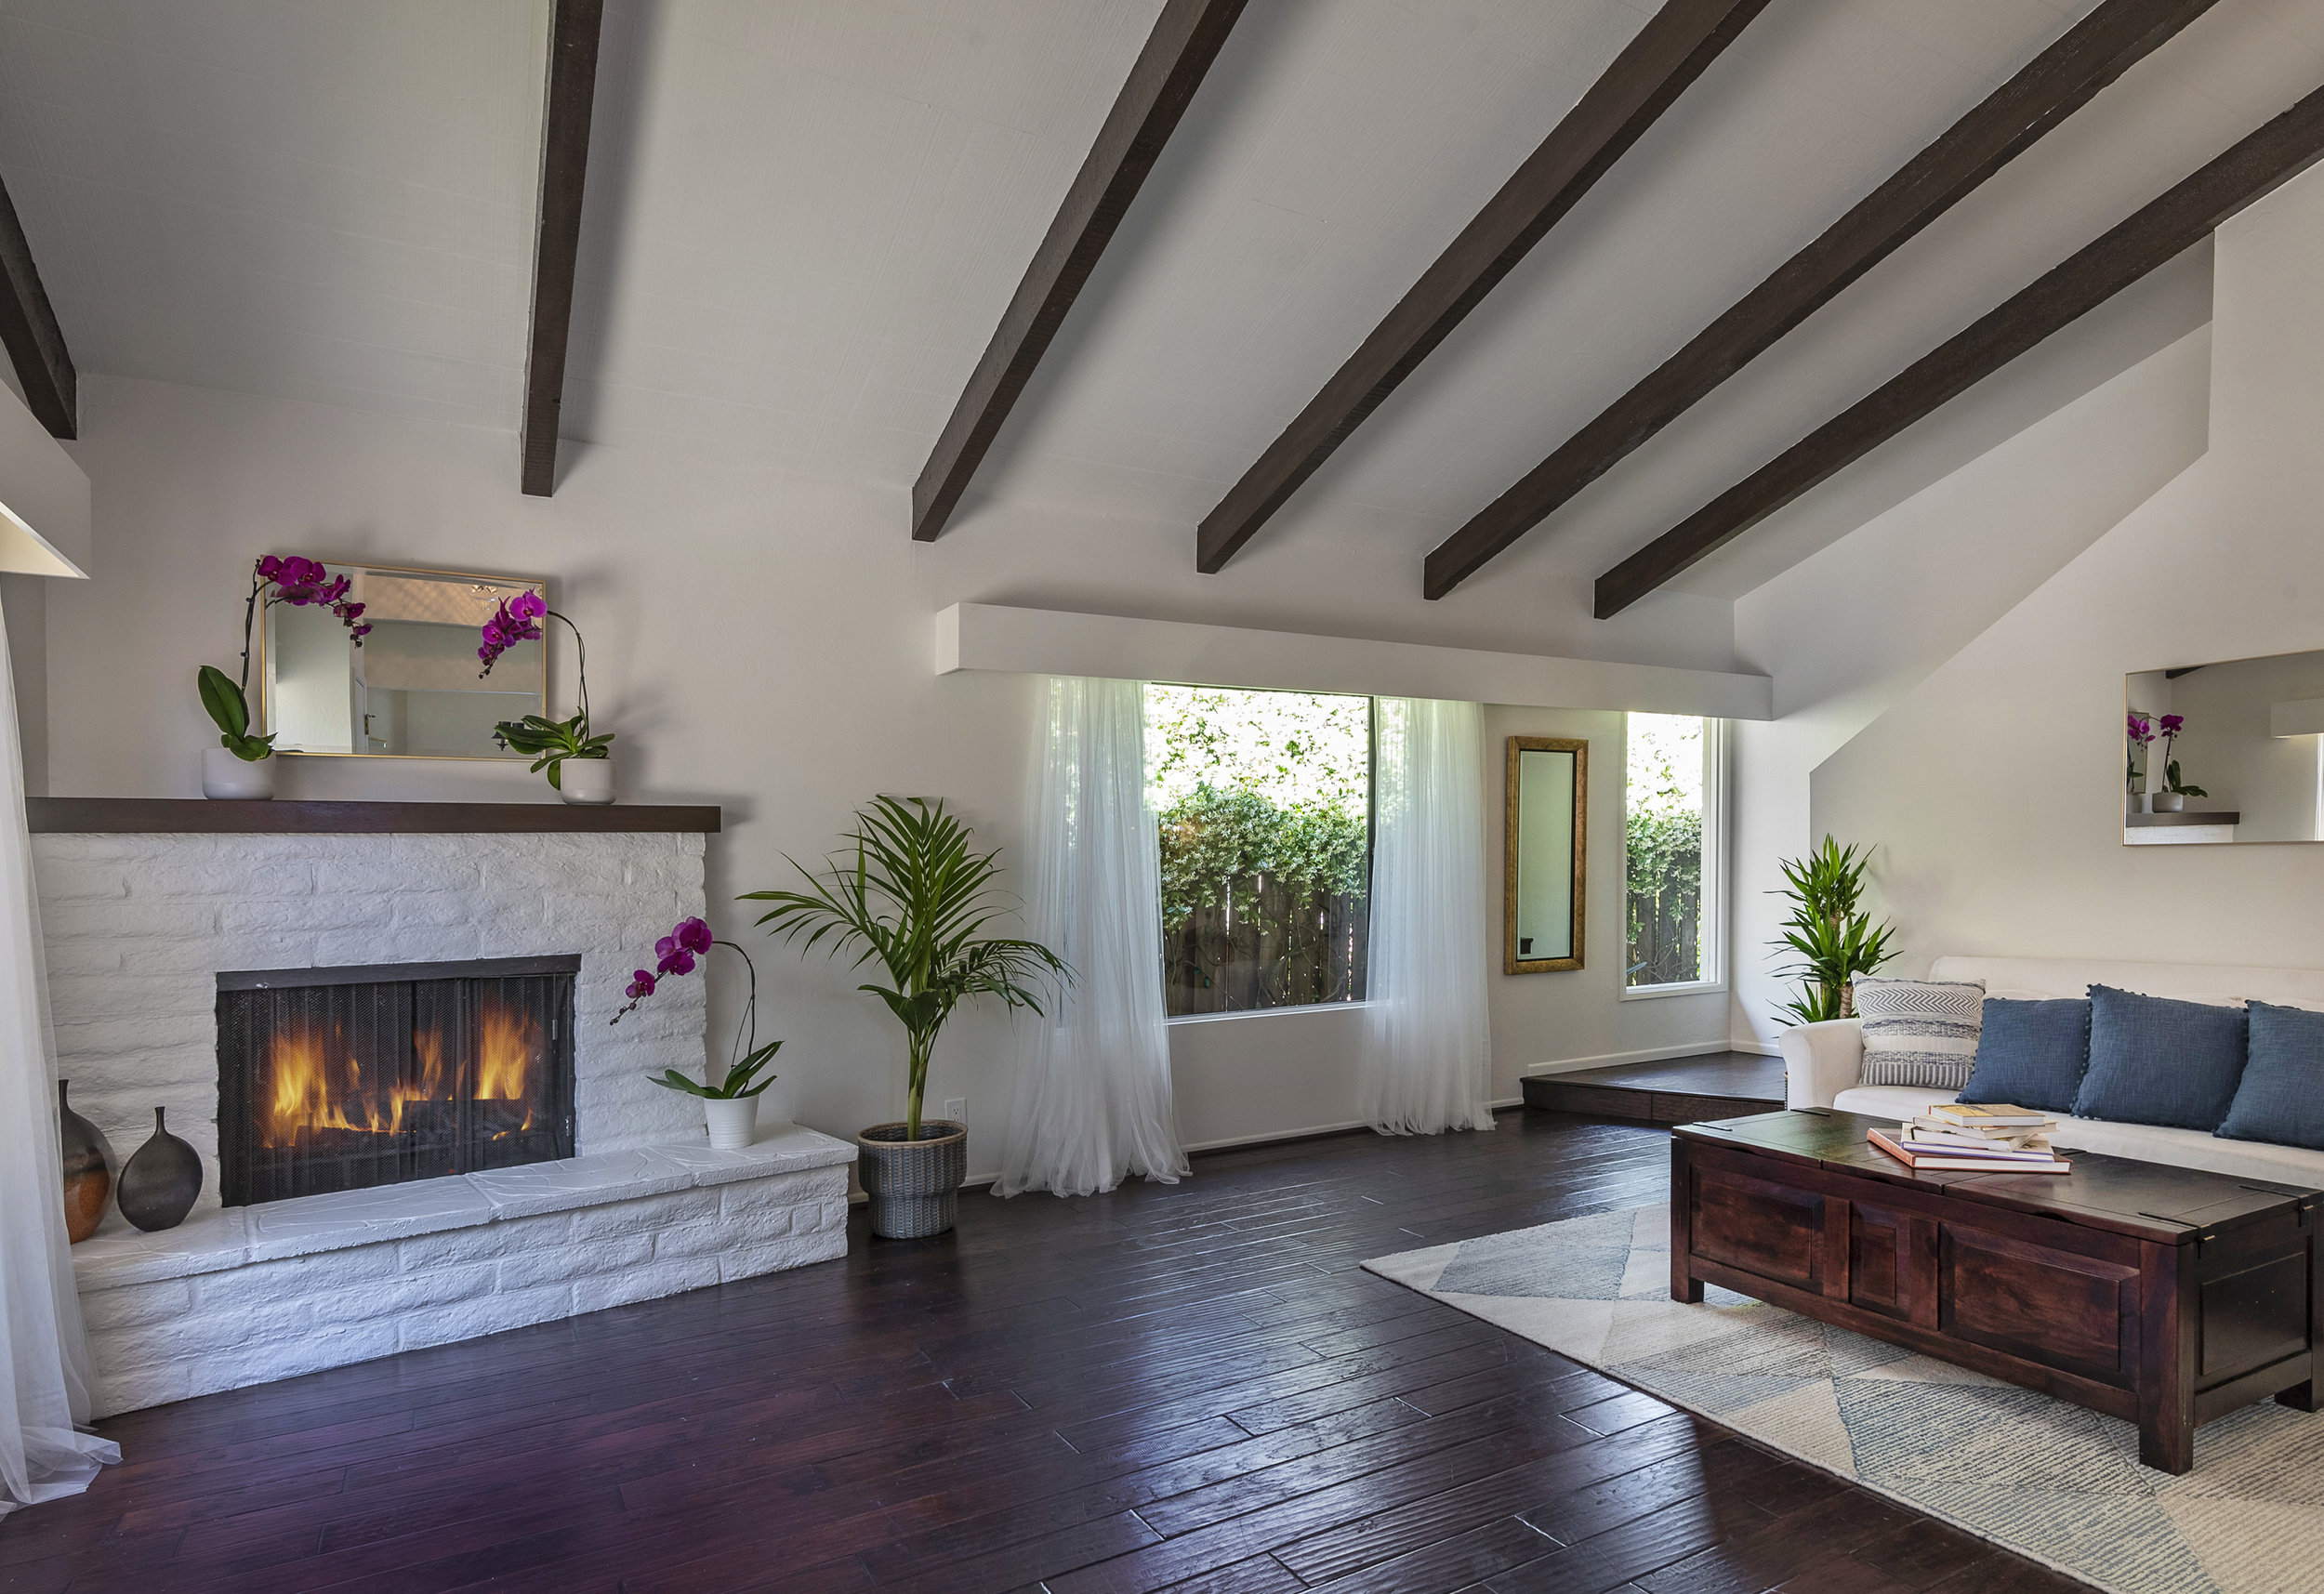 3617 San Remo - $890,000